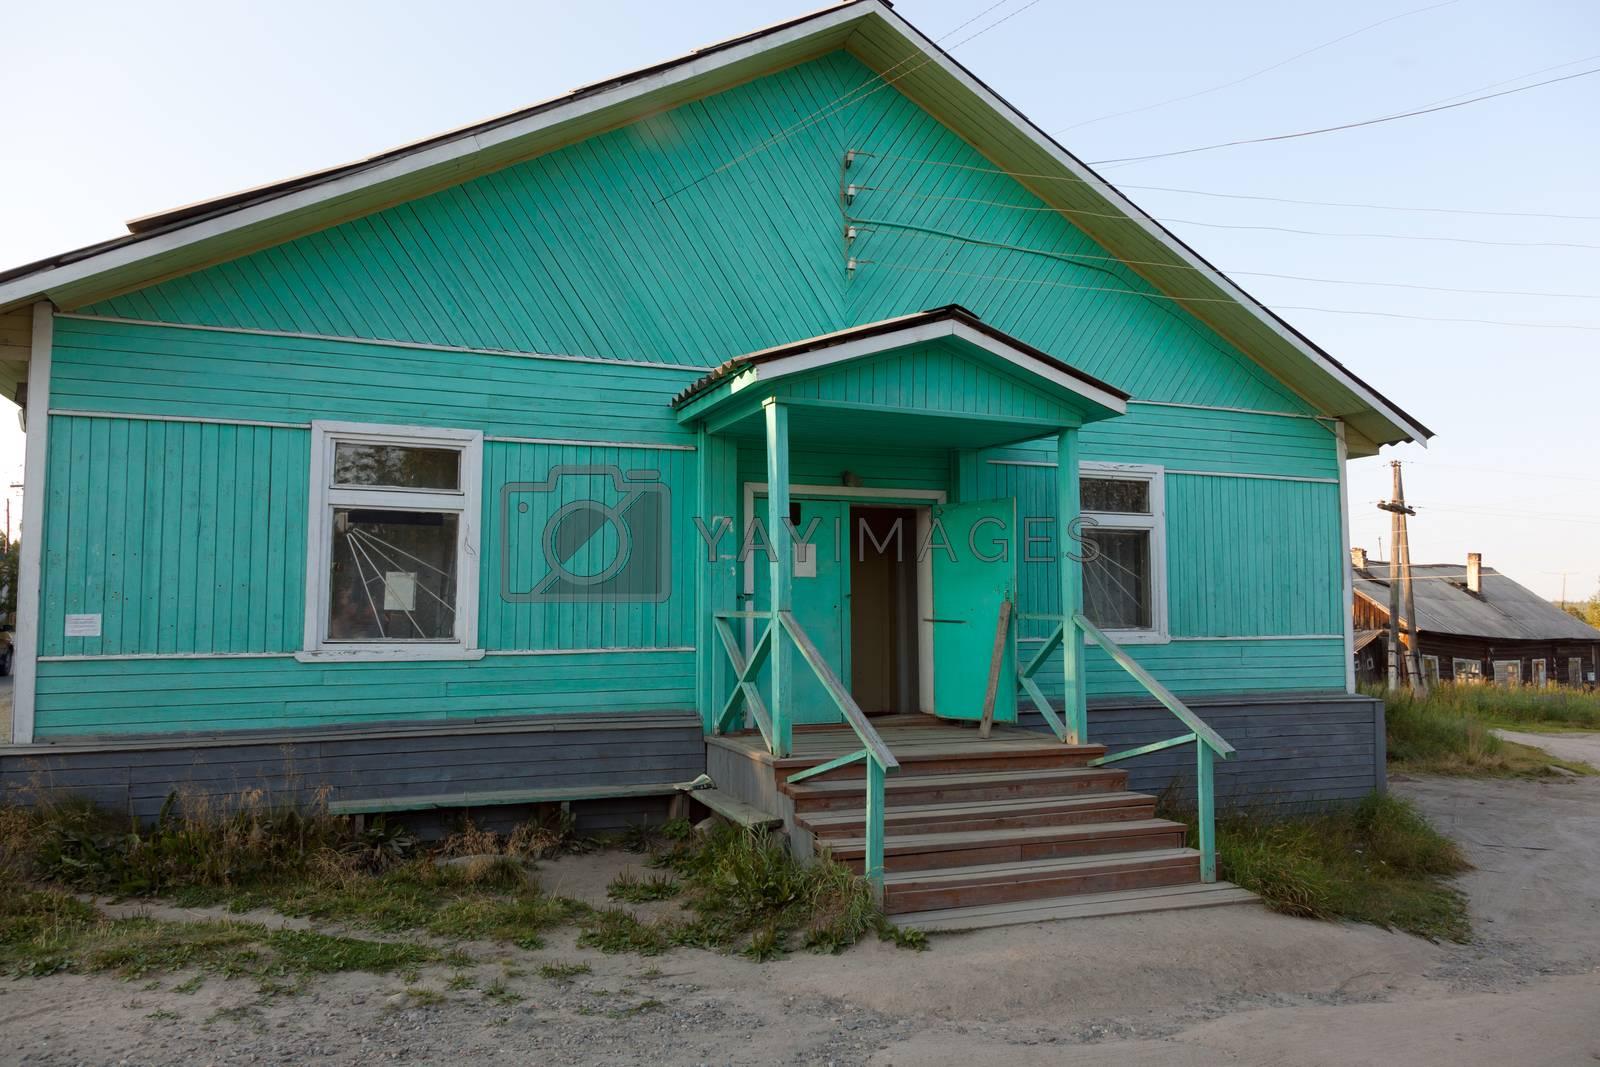 The old blue wooden shop. Umba village, Murmansk region, Russia.